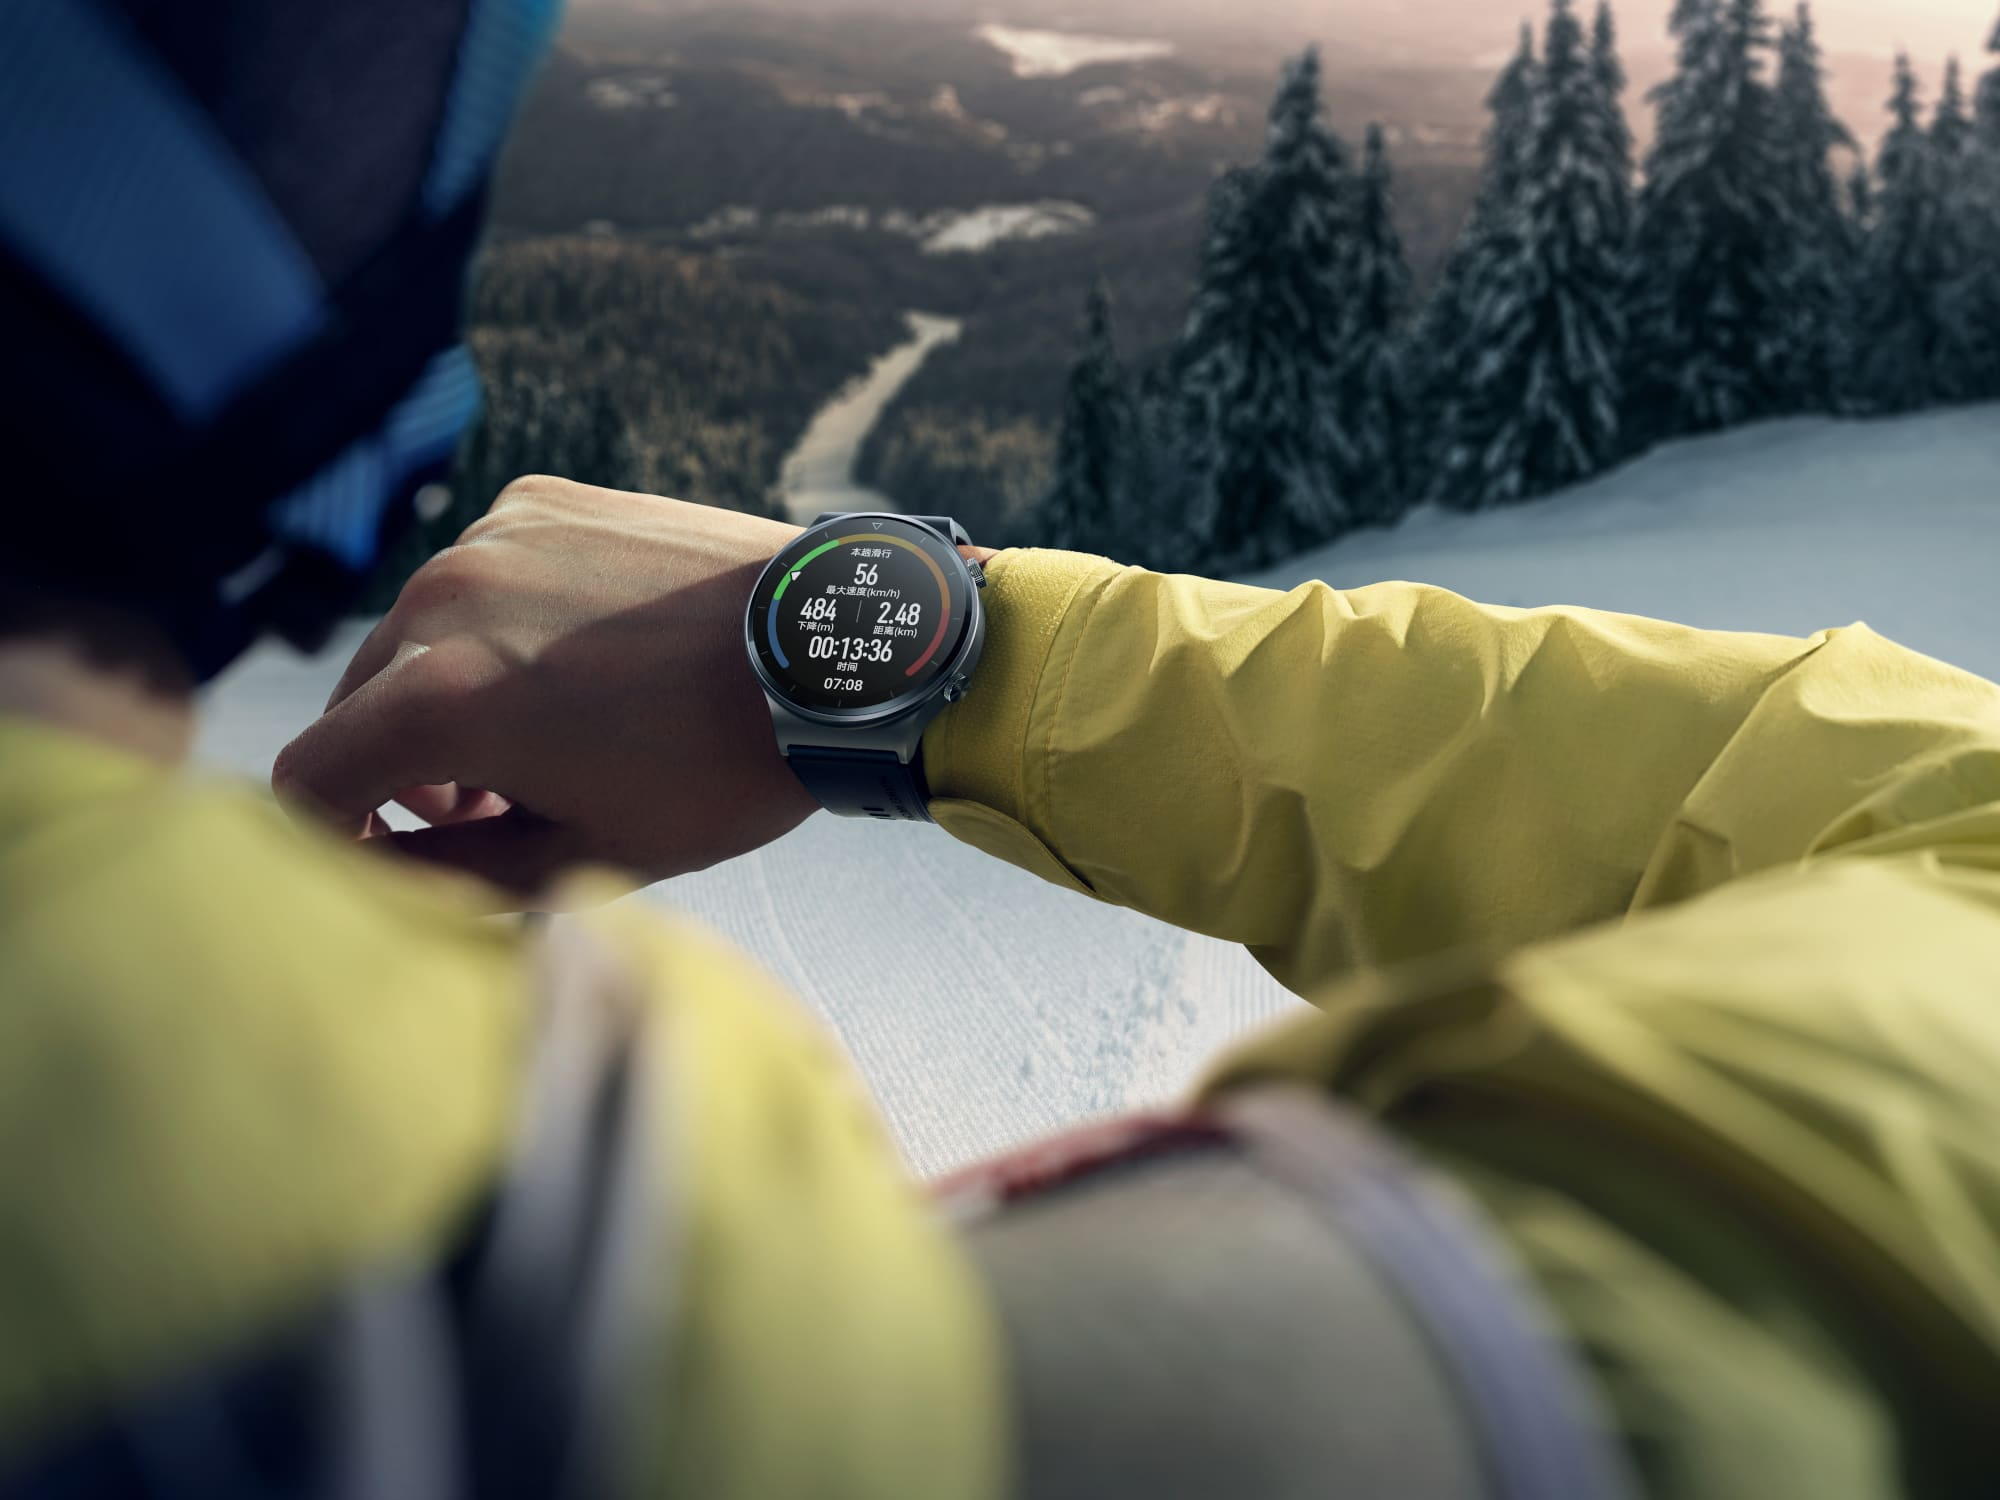 Huawei Watch GT 2 Pro 2 2